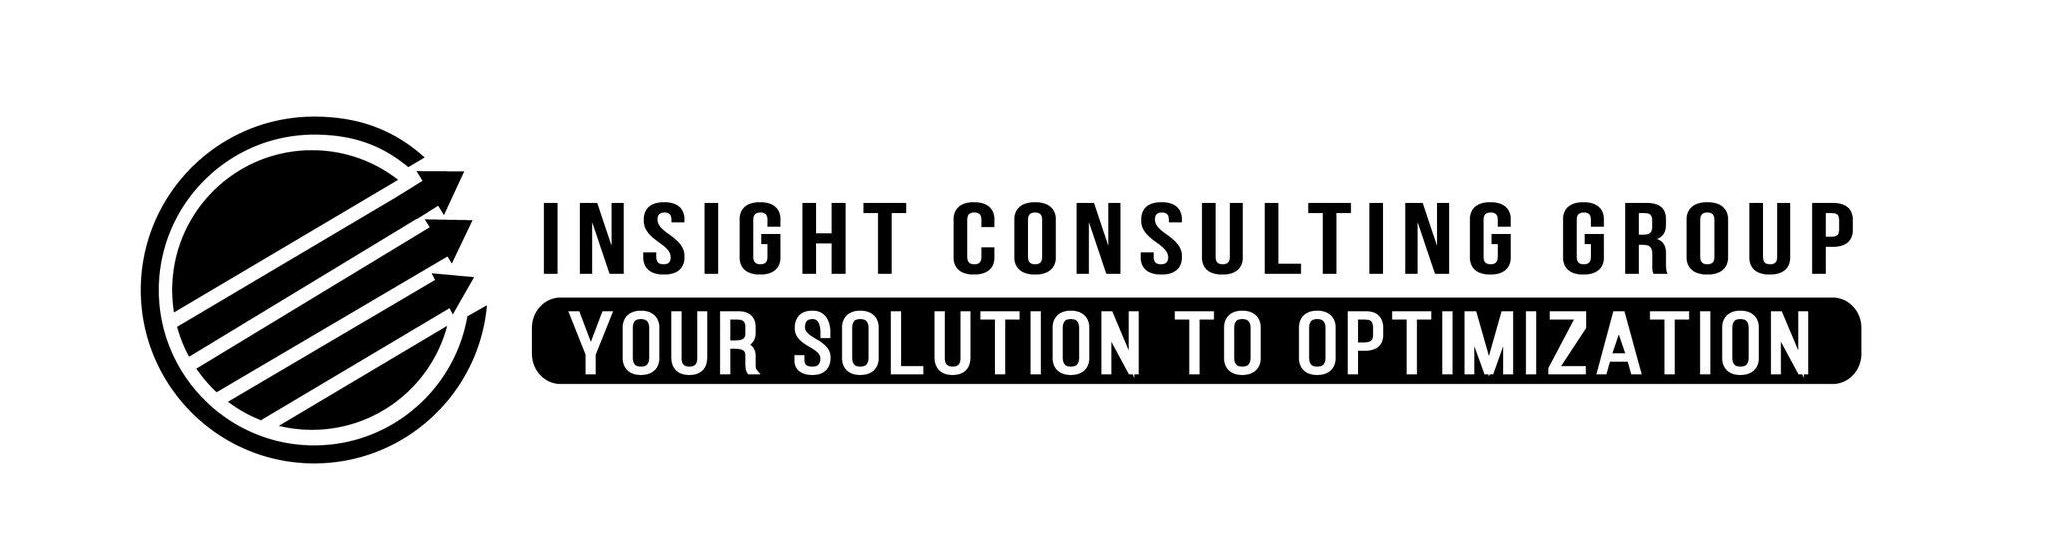 InsightConsulting_2.jpg